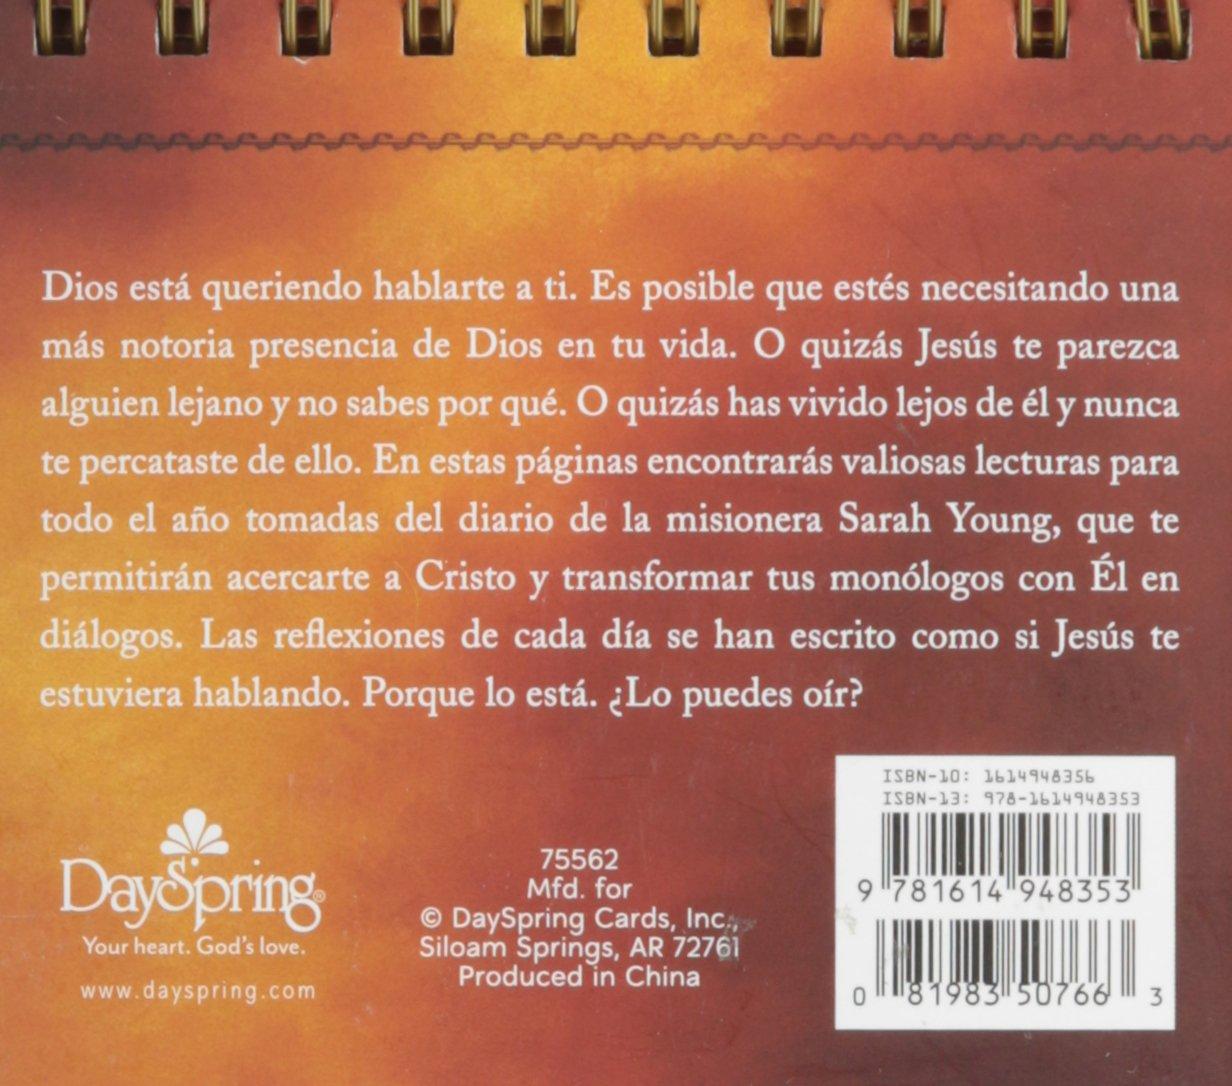 Amazon.com : DaySpring Sarah Young's Spanish Jesus Calling - Jesus Te Llama  DayBrightener Perpetual Flip Calendar, 366 Days : Office Products